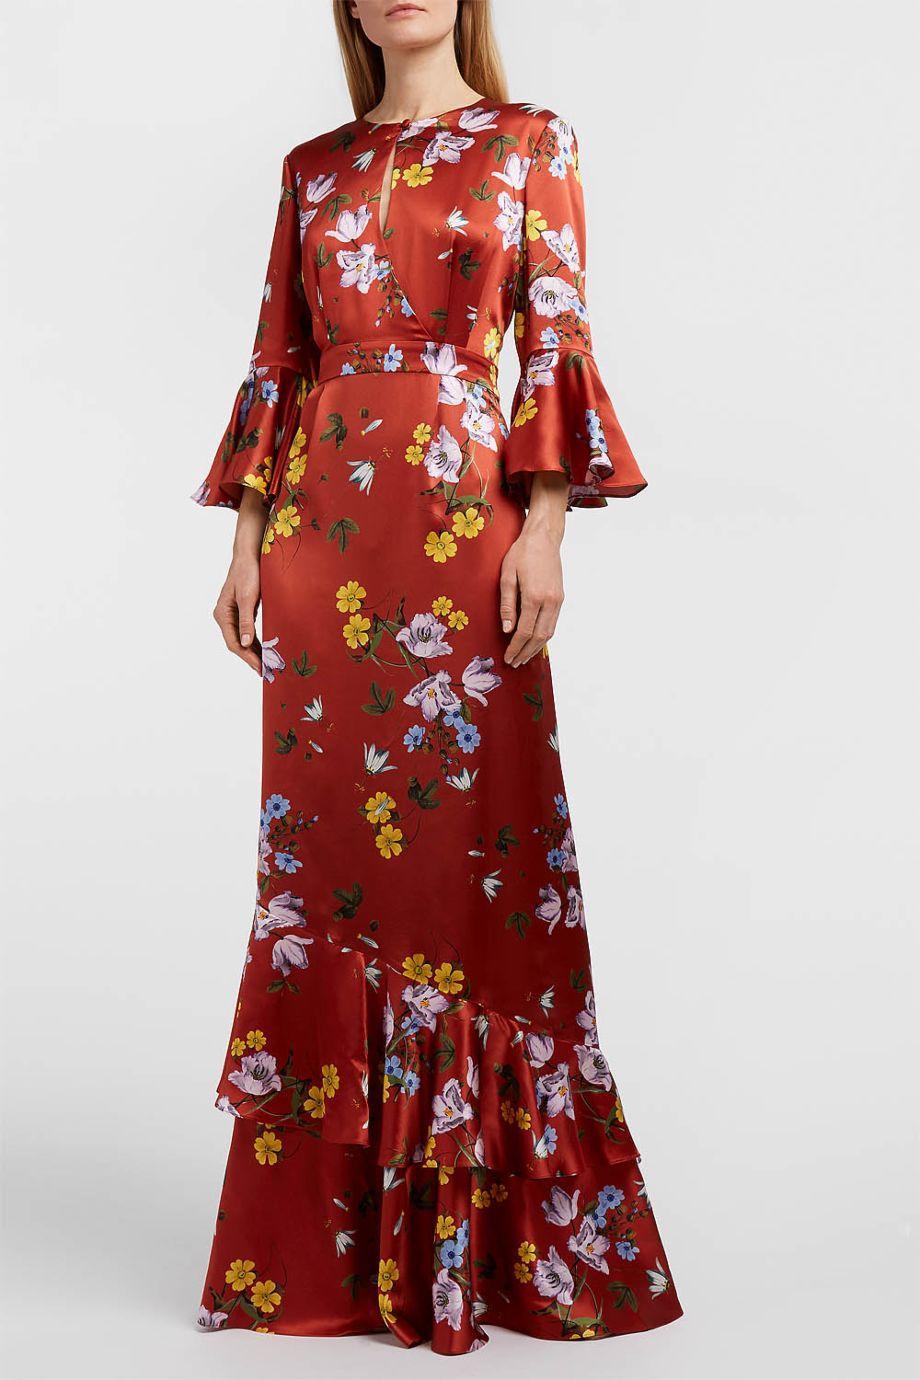 Sale Largest Supplier floral print ruffled blouse Erdem Wholesale Sale Footaction Limit Offer Cheap Find Great Online 0SeGEyksAT